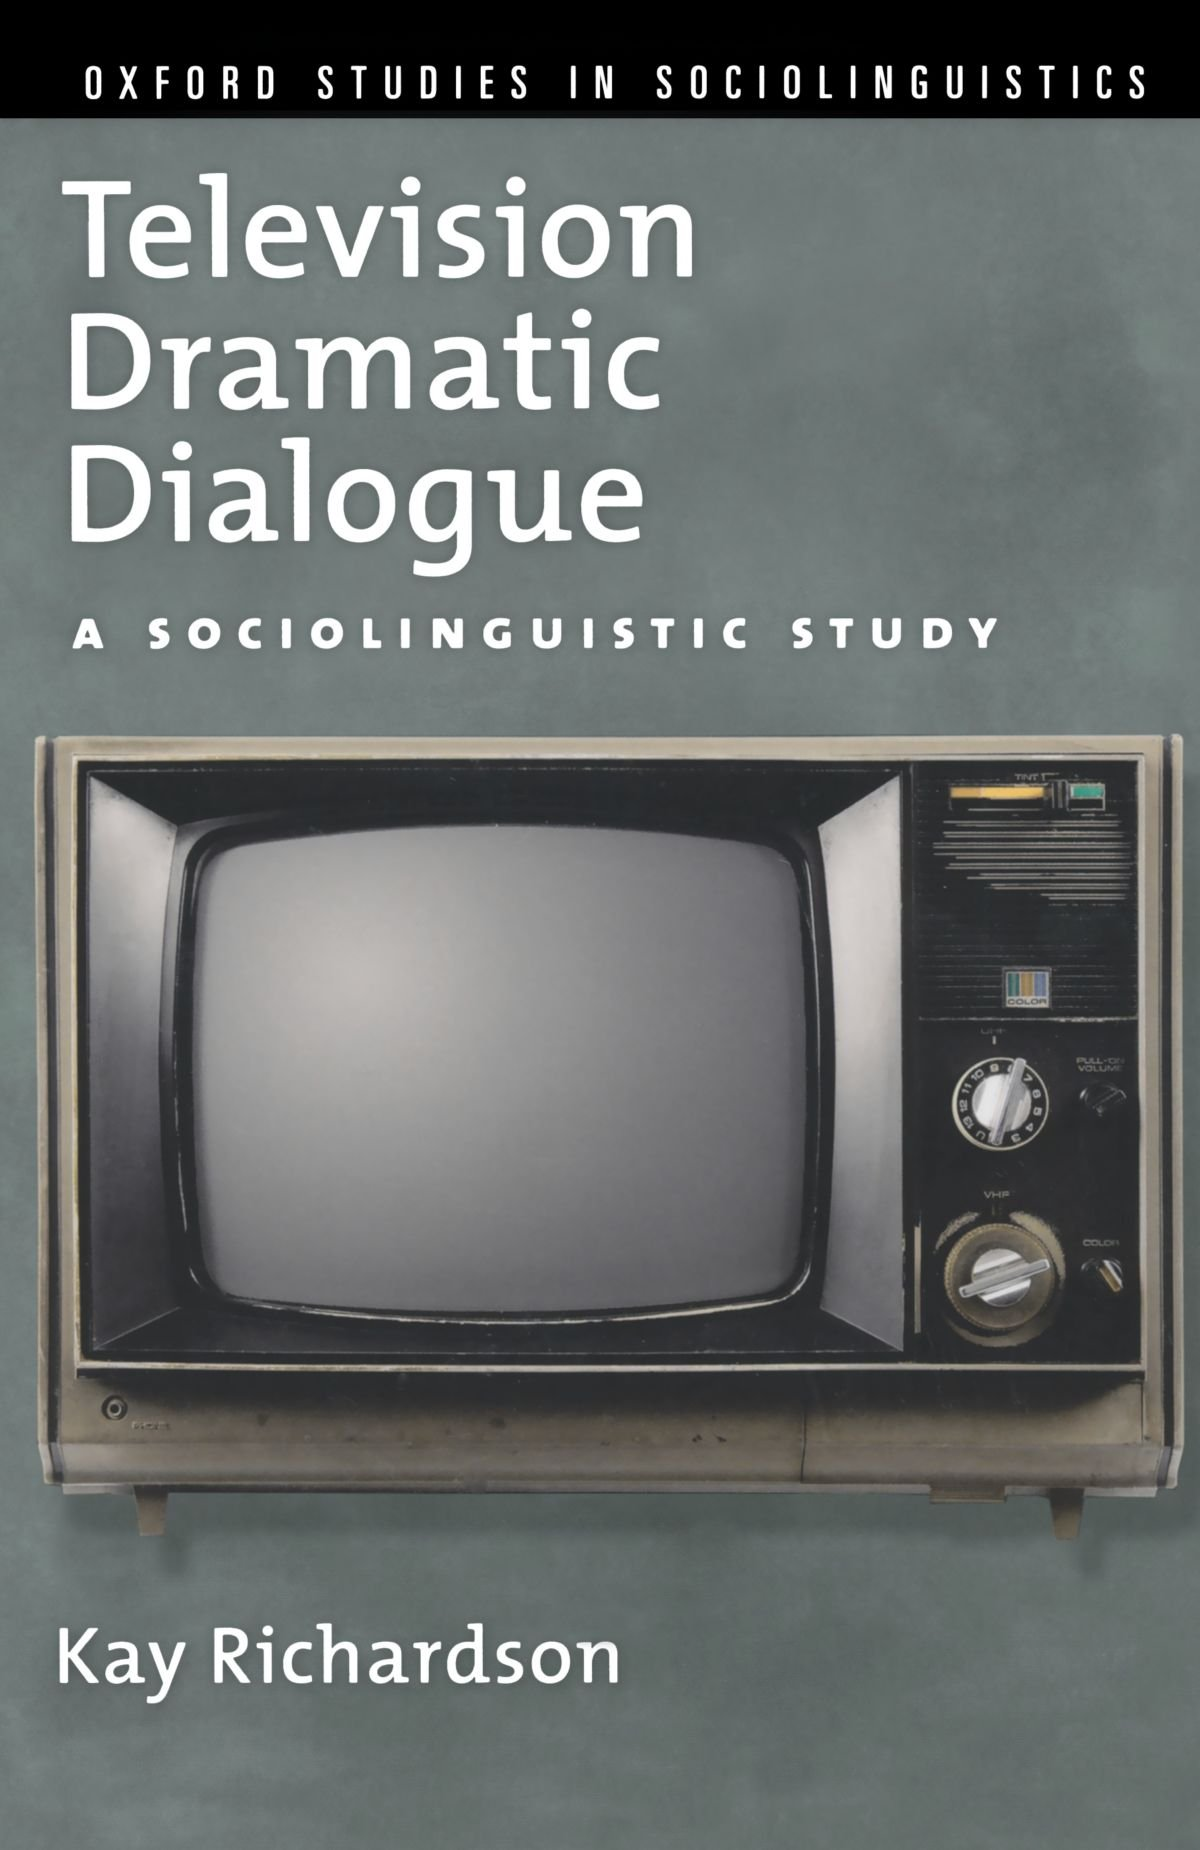 Television Dramatic Dialogue  A Sociolinguistic Study  Oxford Studies In Sociolinguistics